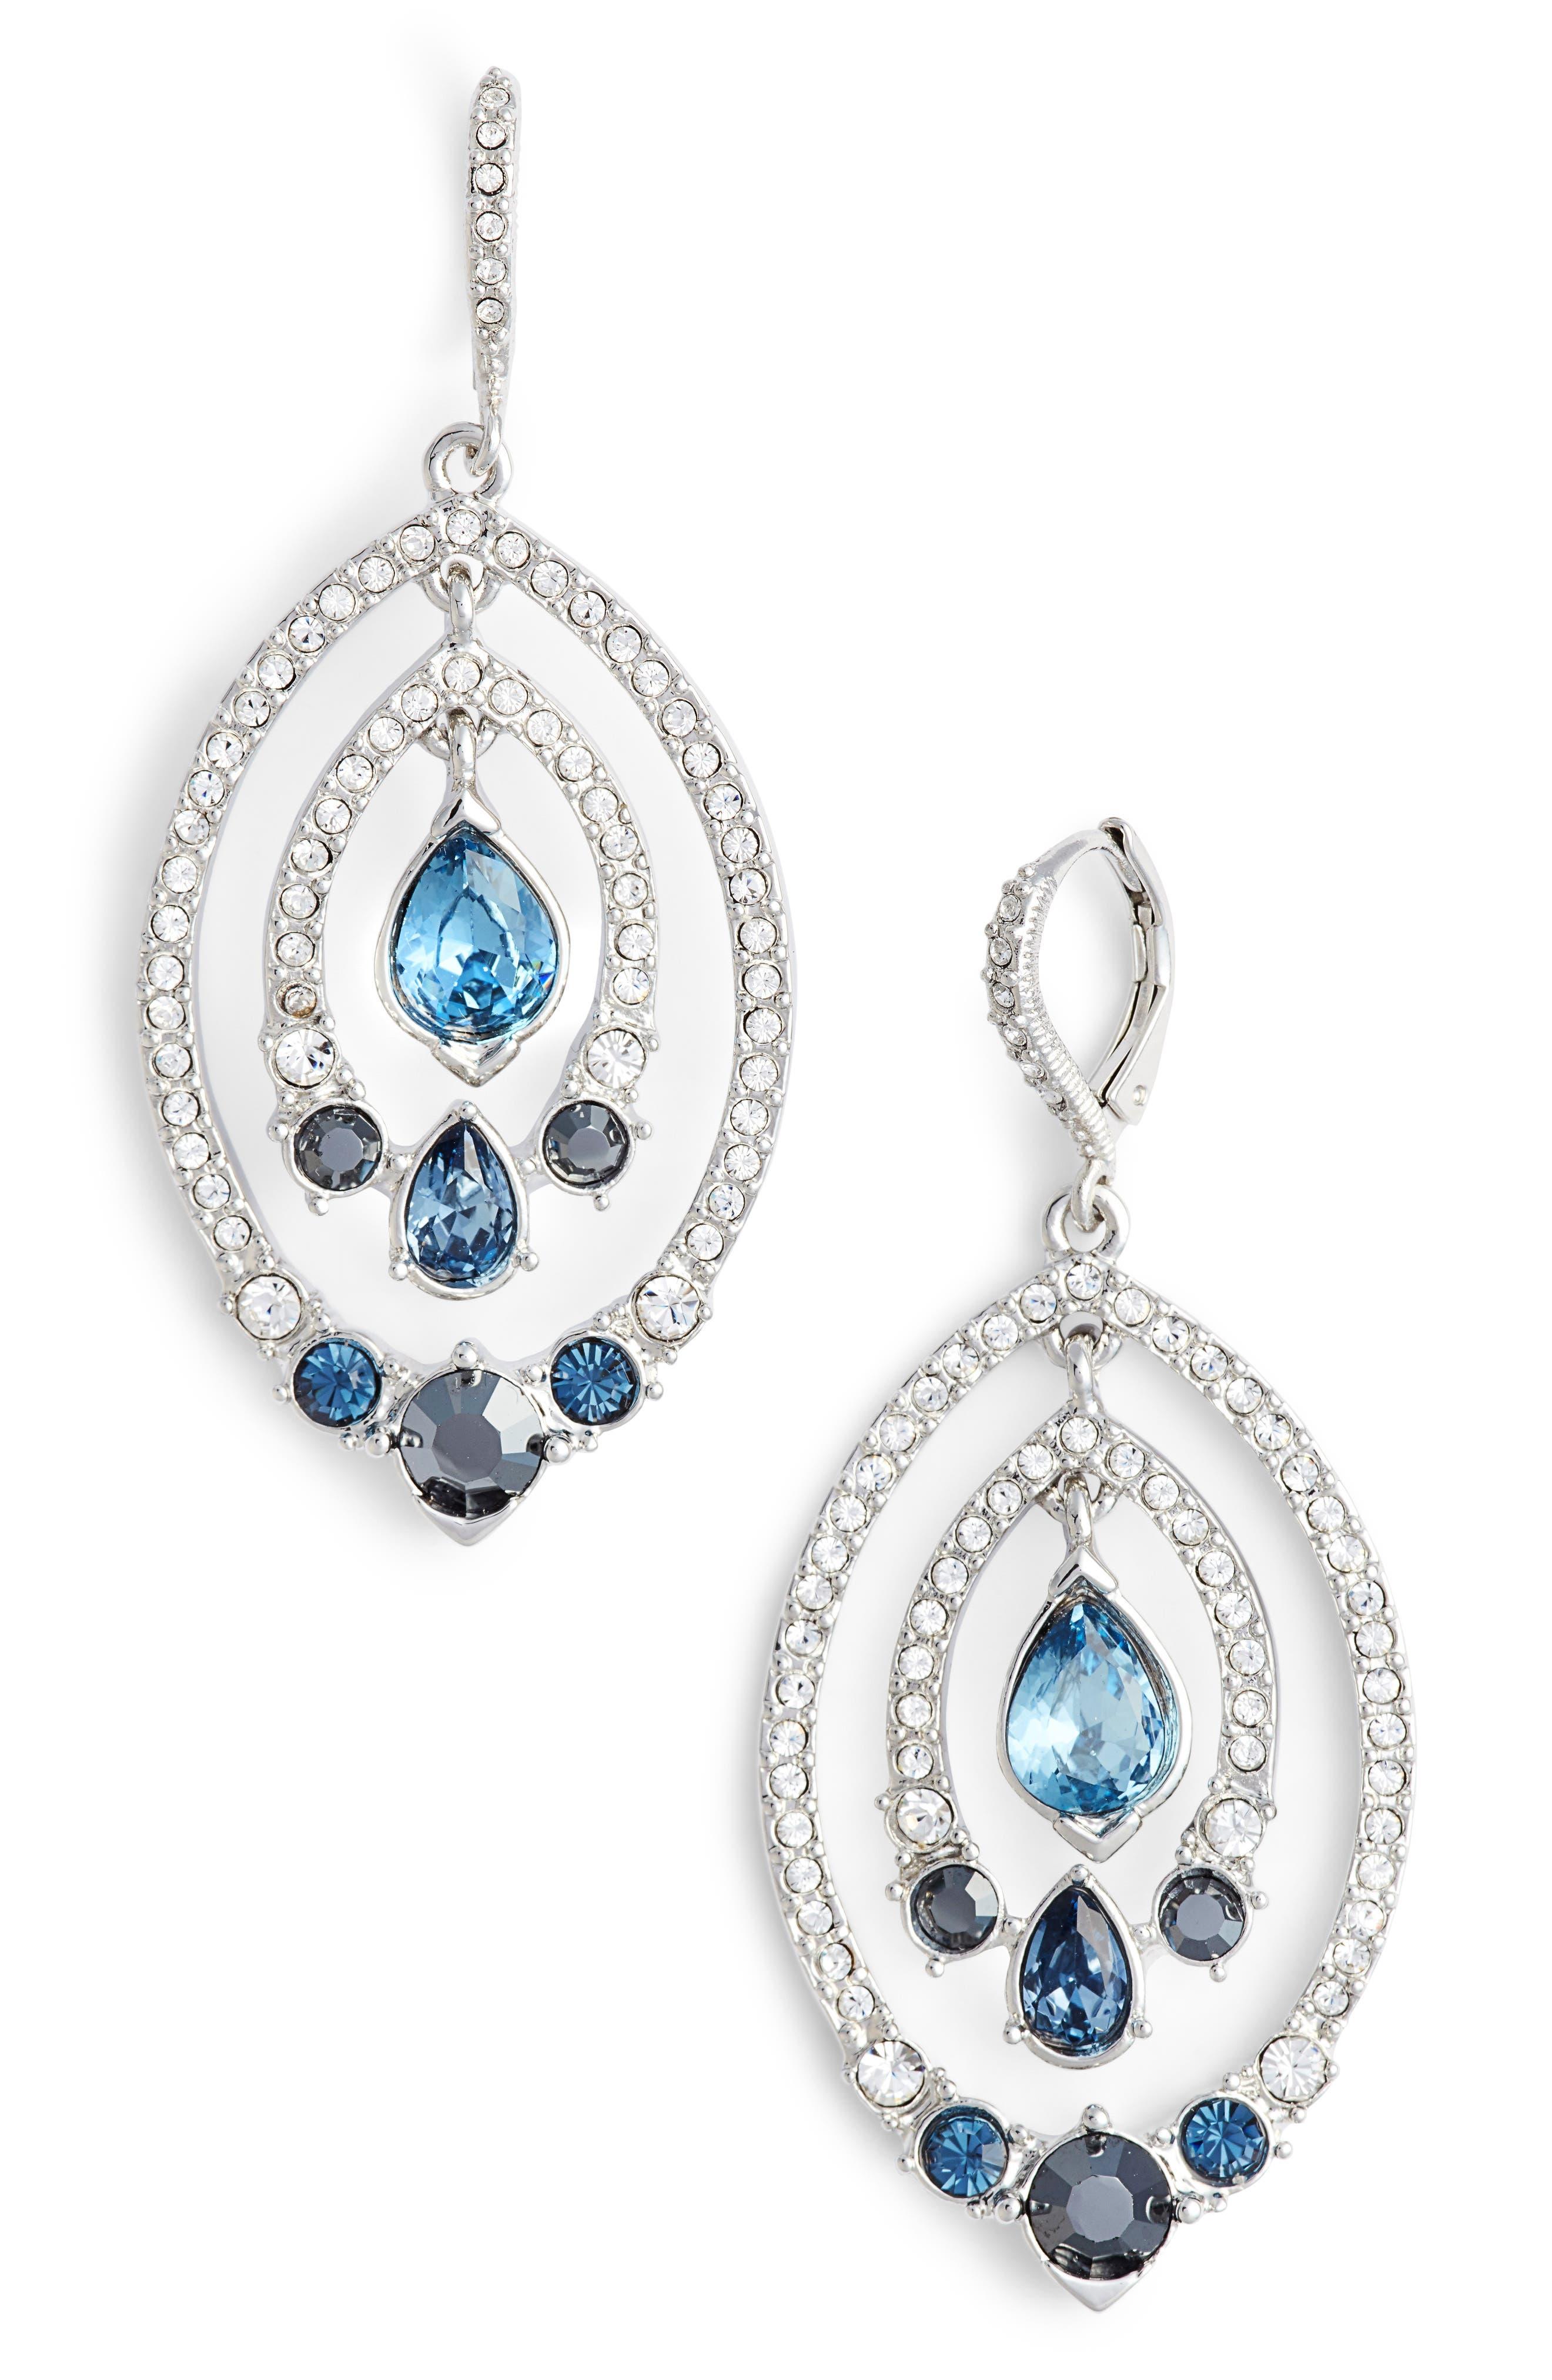 Orbiting Drop earrings,                             Main thumbnail 1, color,                             Silver/ Crystal/ Blue Multi